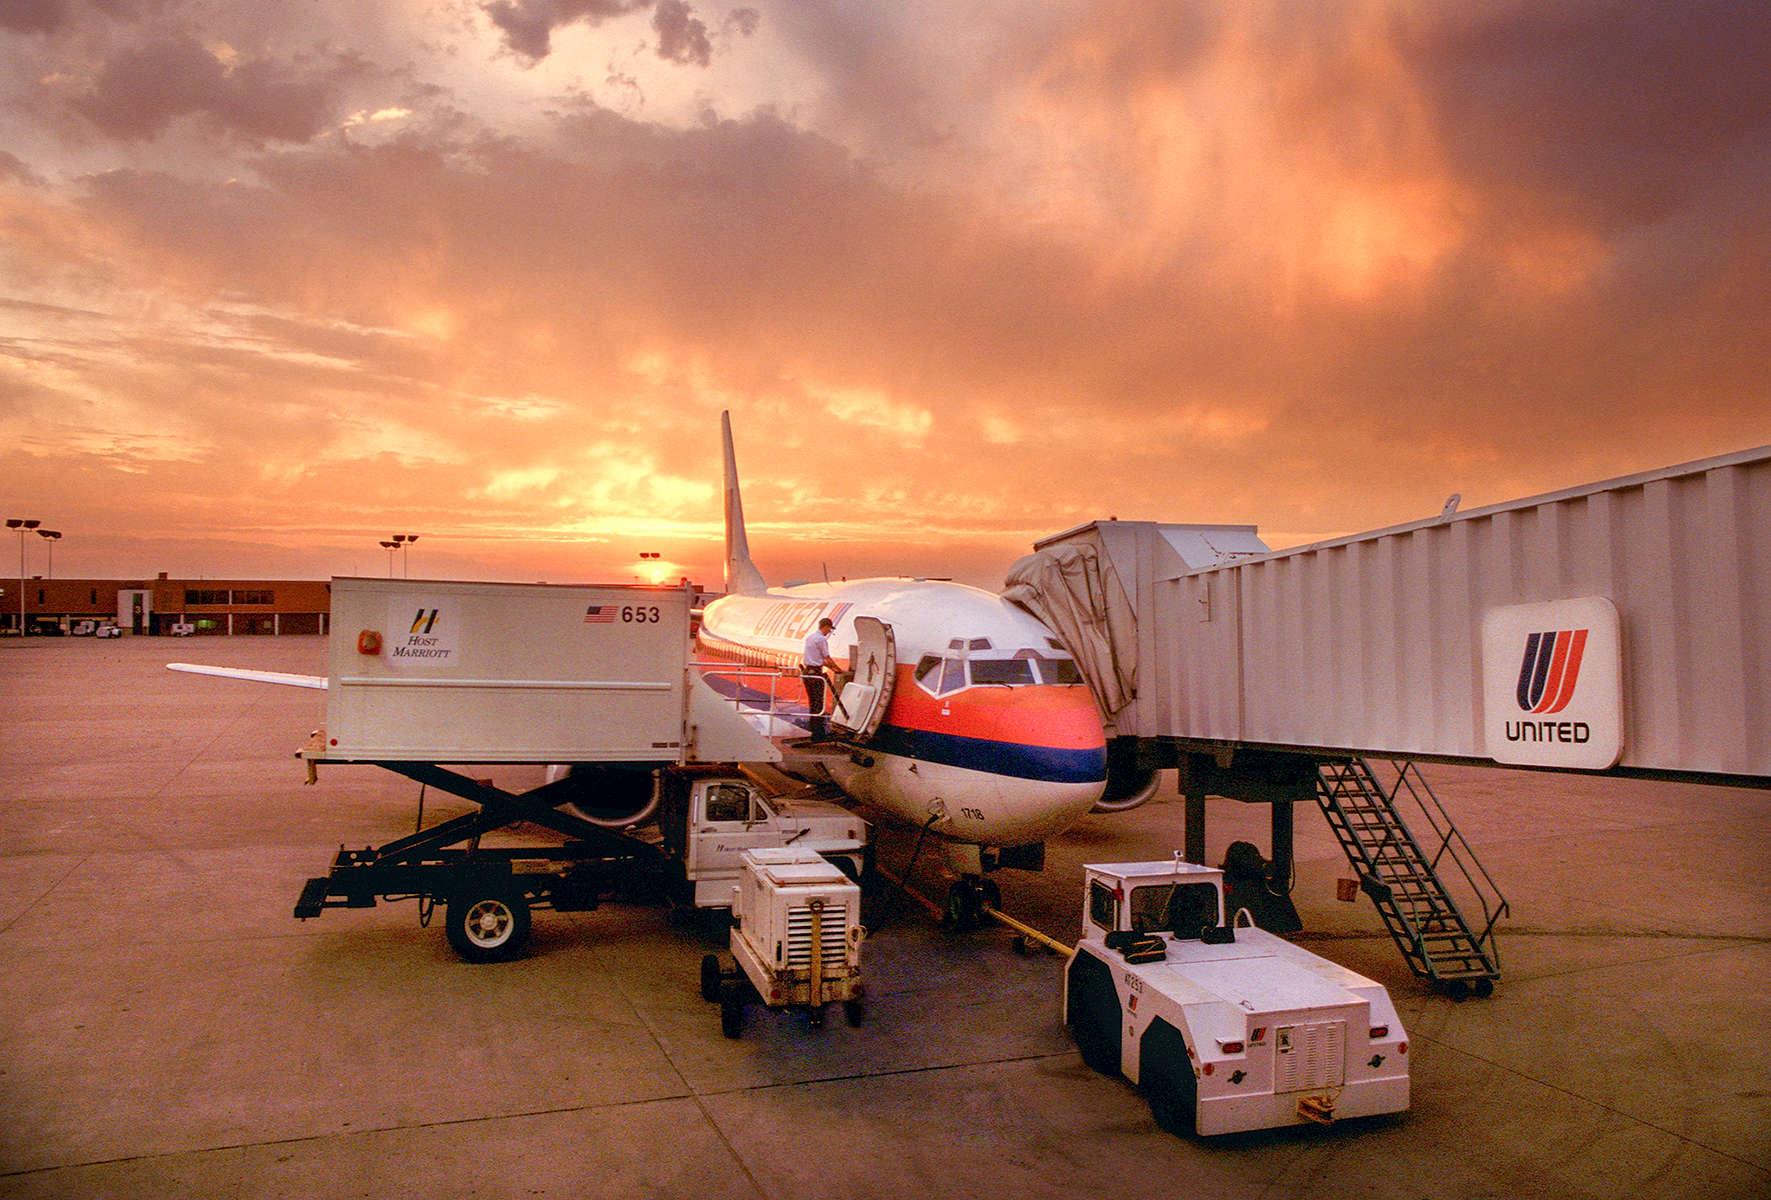 united-plane_sunrise-J1w